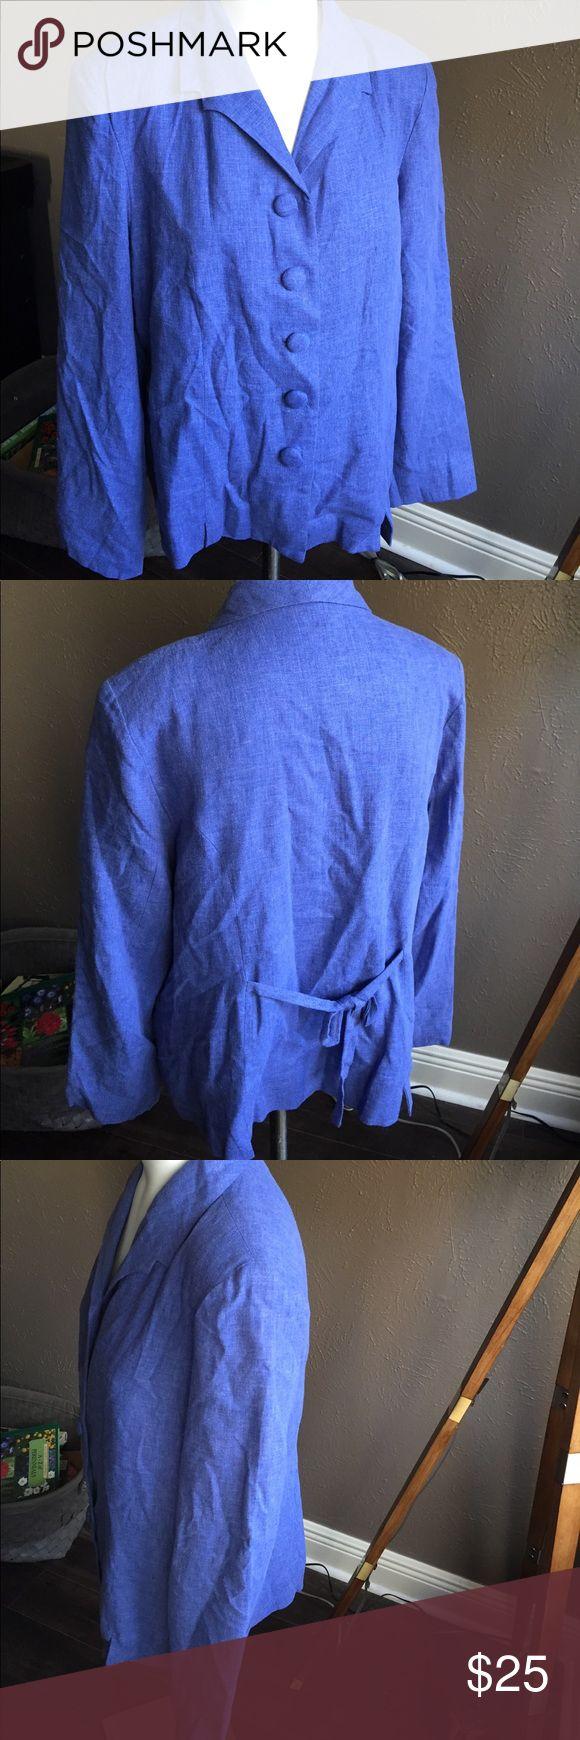 "April Cornell Linen Rayon Blazer jacket Sz M blue Cute blazer in a soft Linen Blend. Chest: 42""; sleeve from shoulder: 23.5""; length from neck/collar seam: 24"" April Cornell Jackets & Coats Blazers"